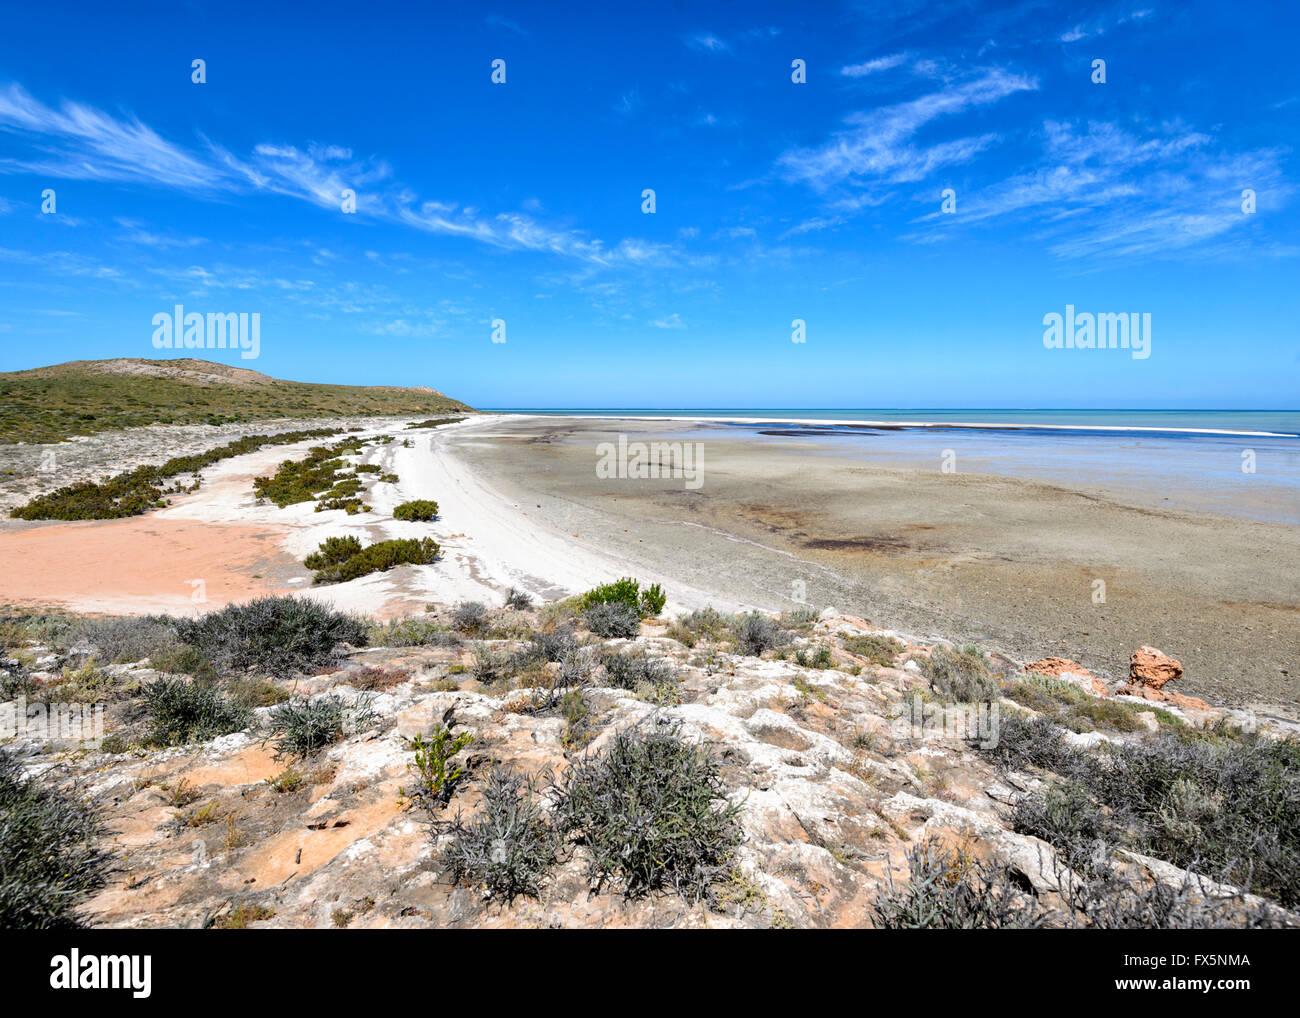 La baie Shark, Australie occidentale, WA, Australie Photo Stock